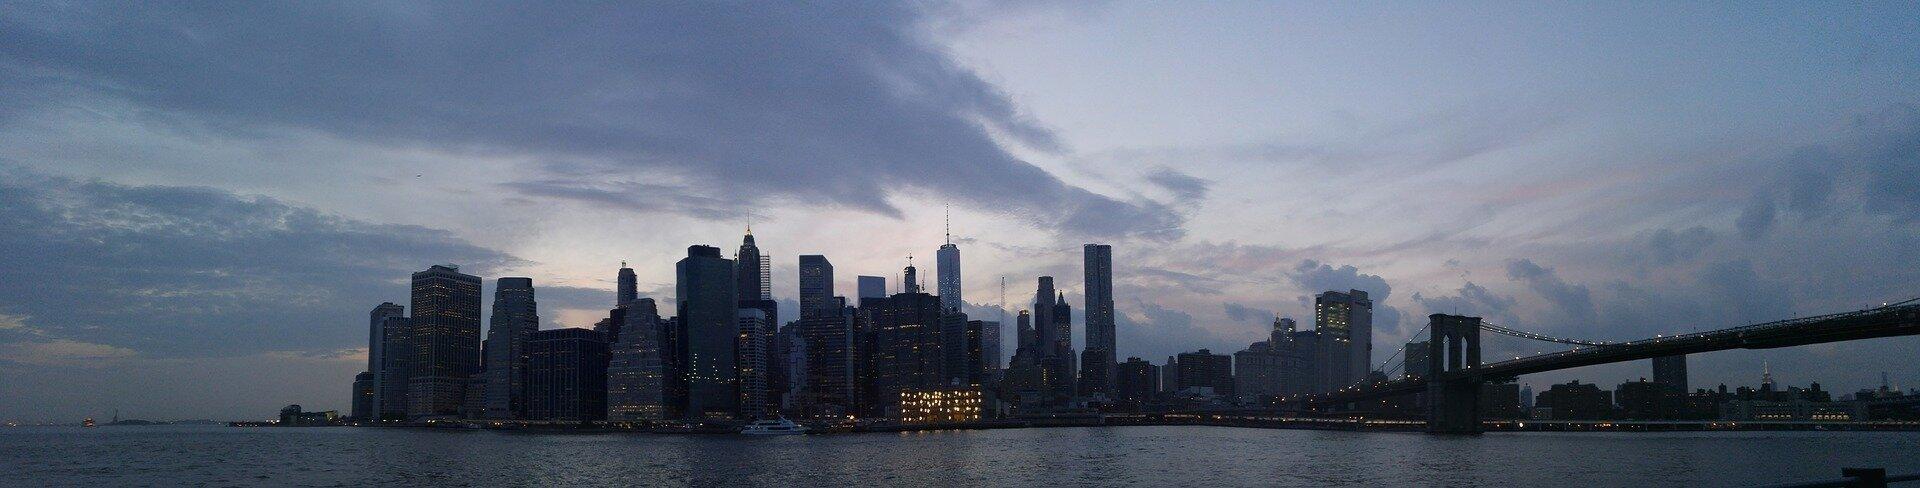 new-york-1920757_1920